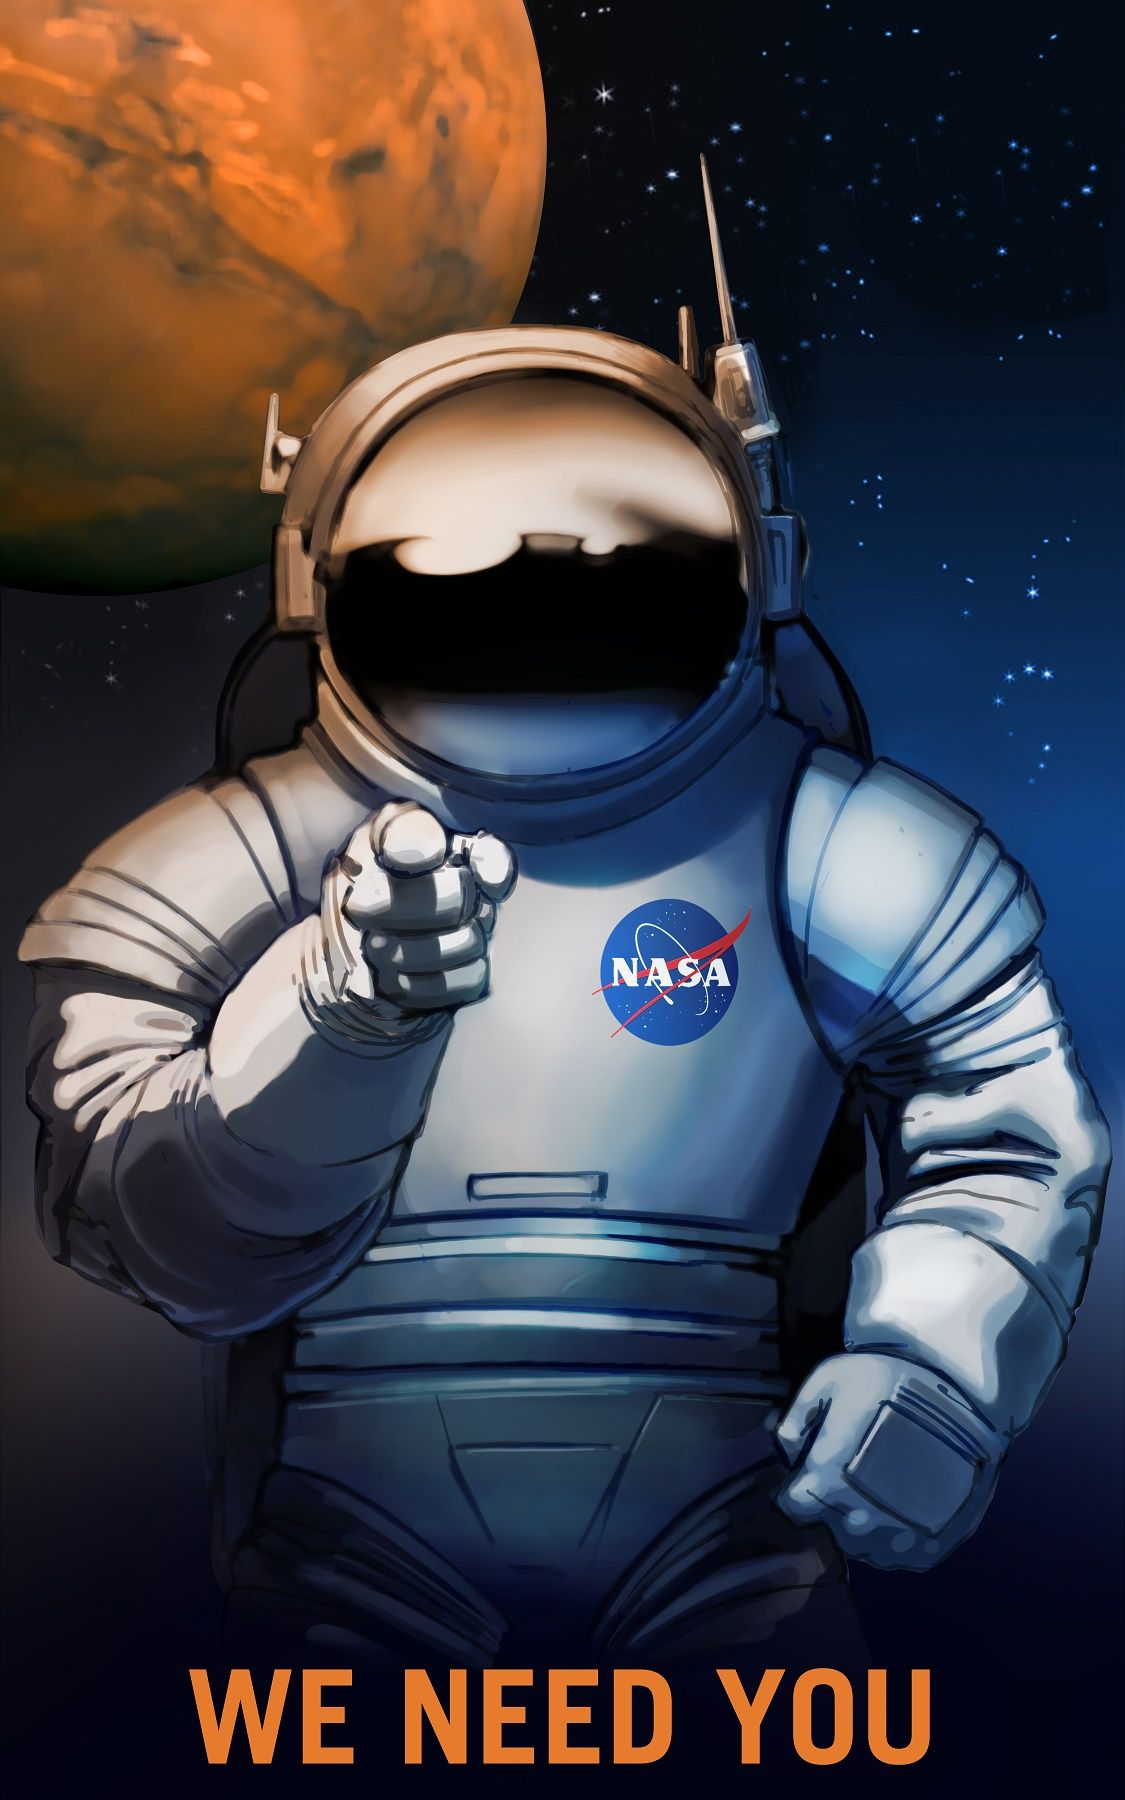 NASA poster Mars exploration